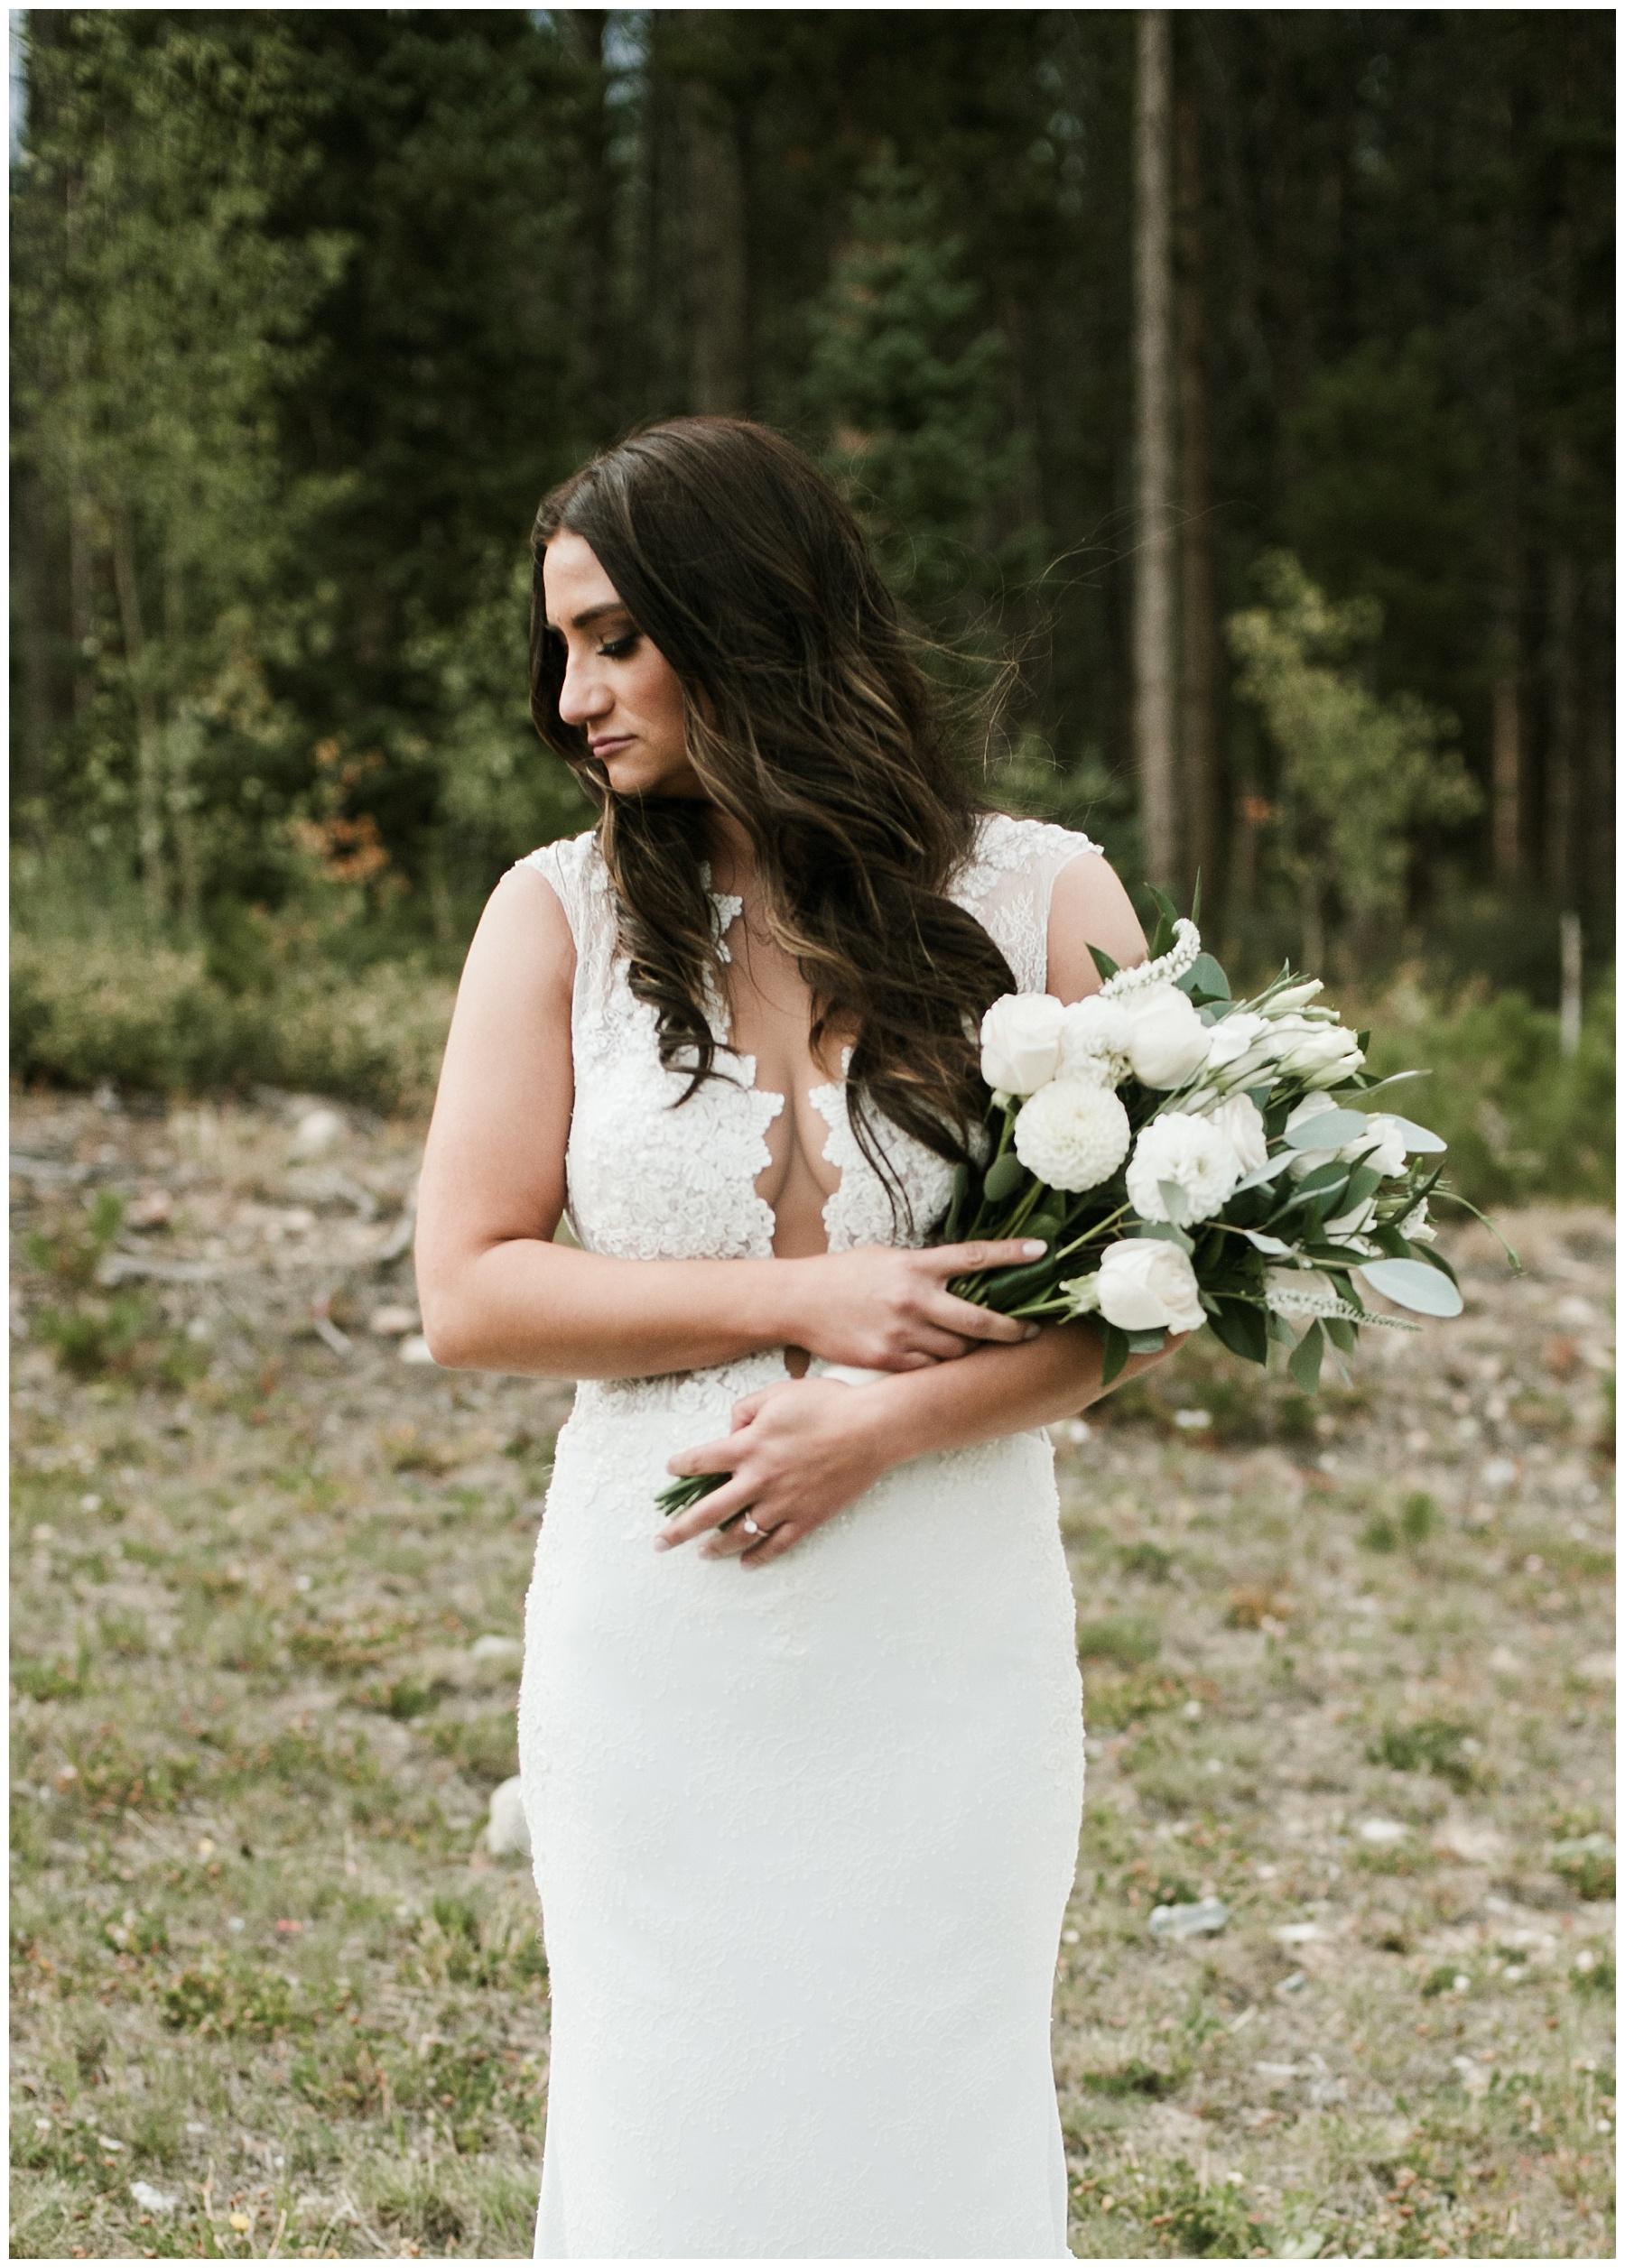 Katesalleyphotography-257_married in Breckenridge.jpg